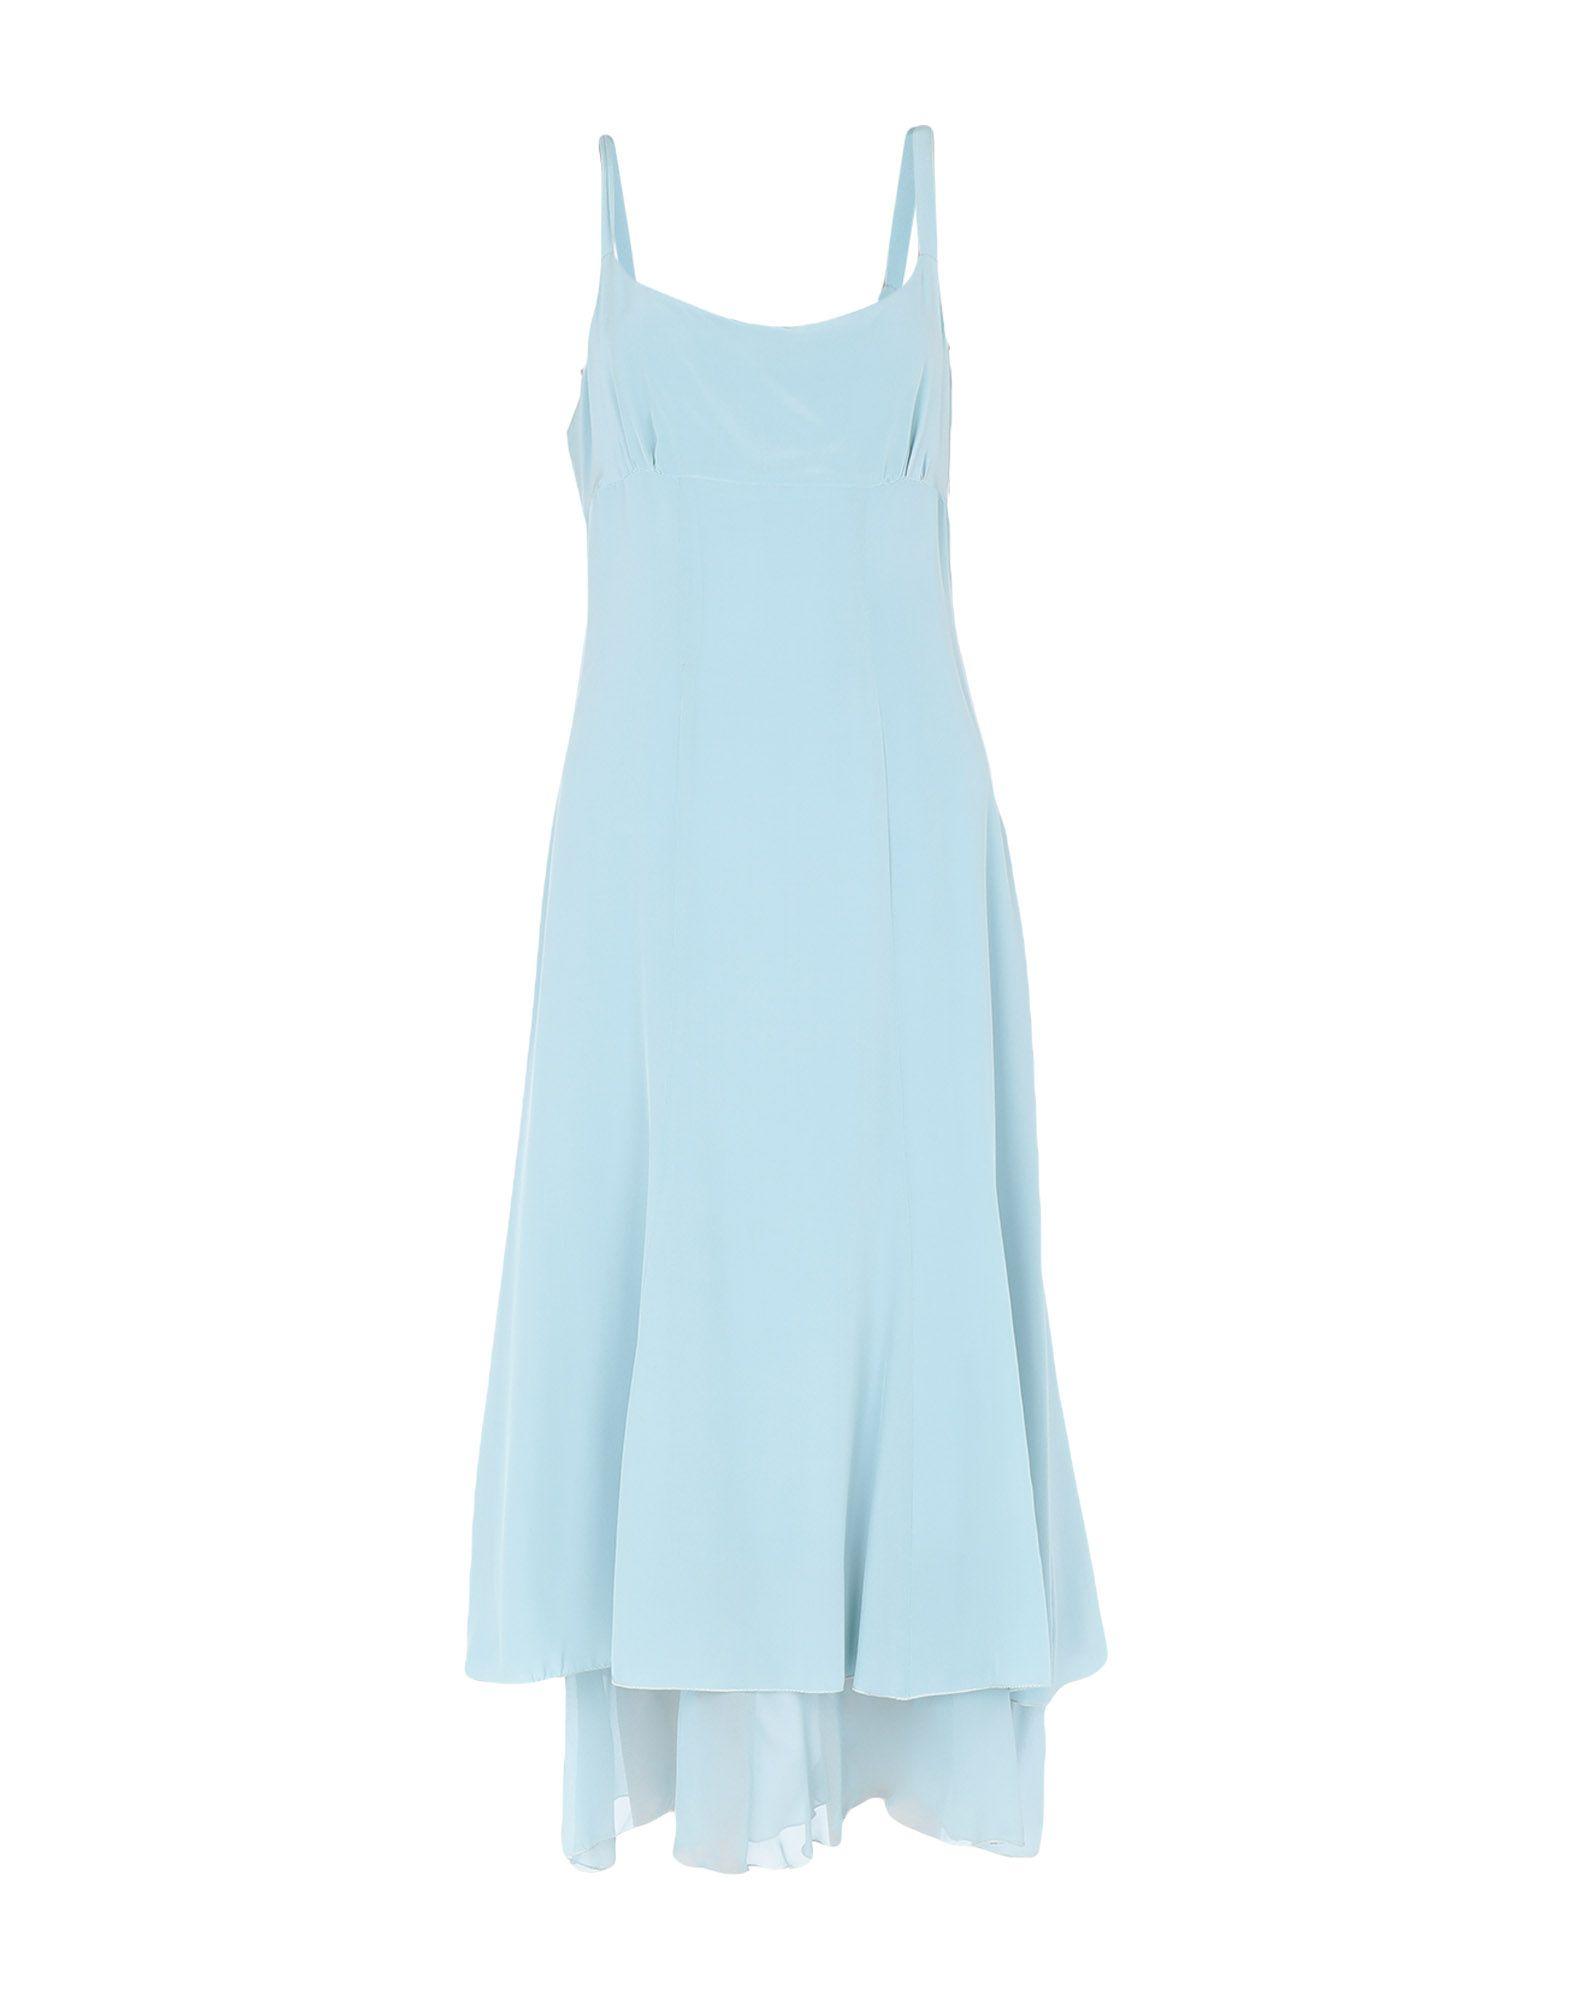 MY TIME Платье длиной 3/4 платье quelle my style 1003975 page 4